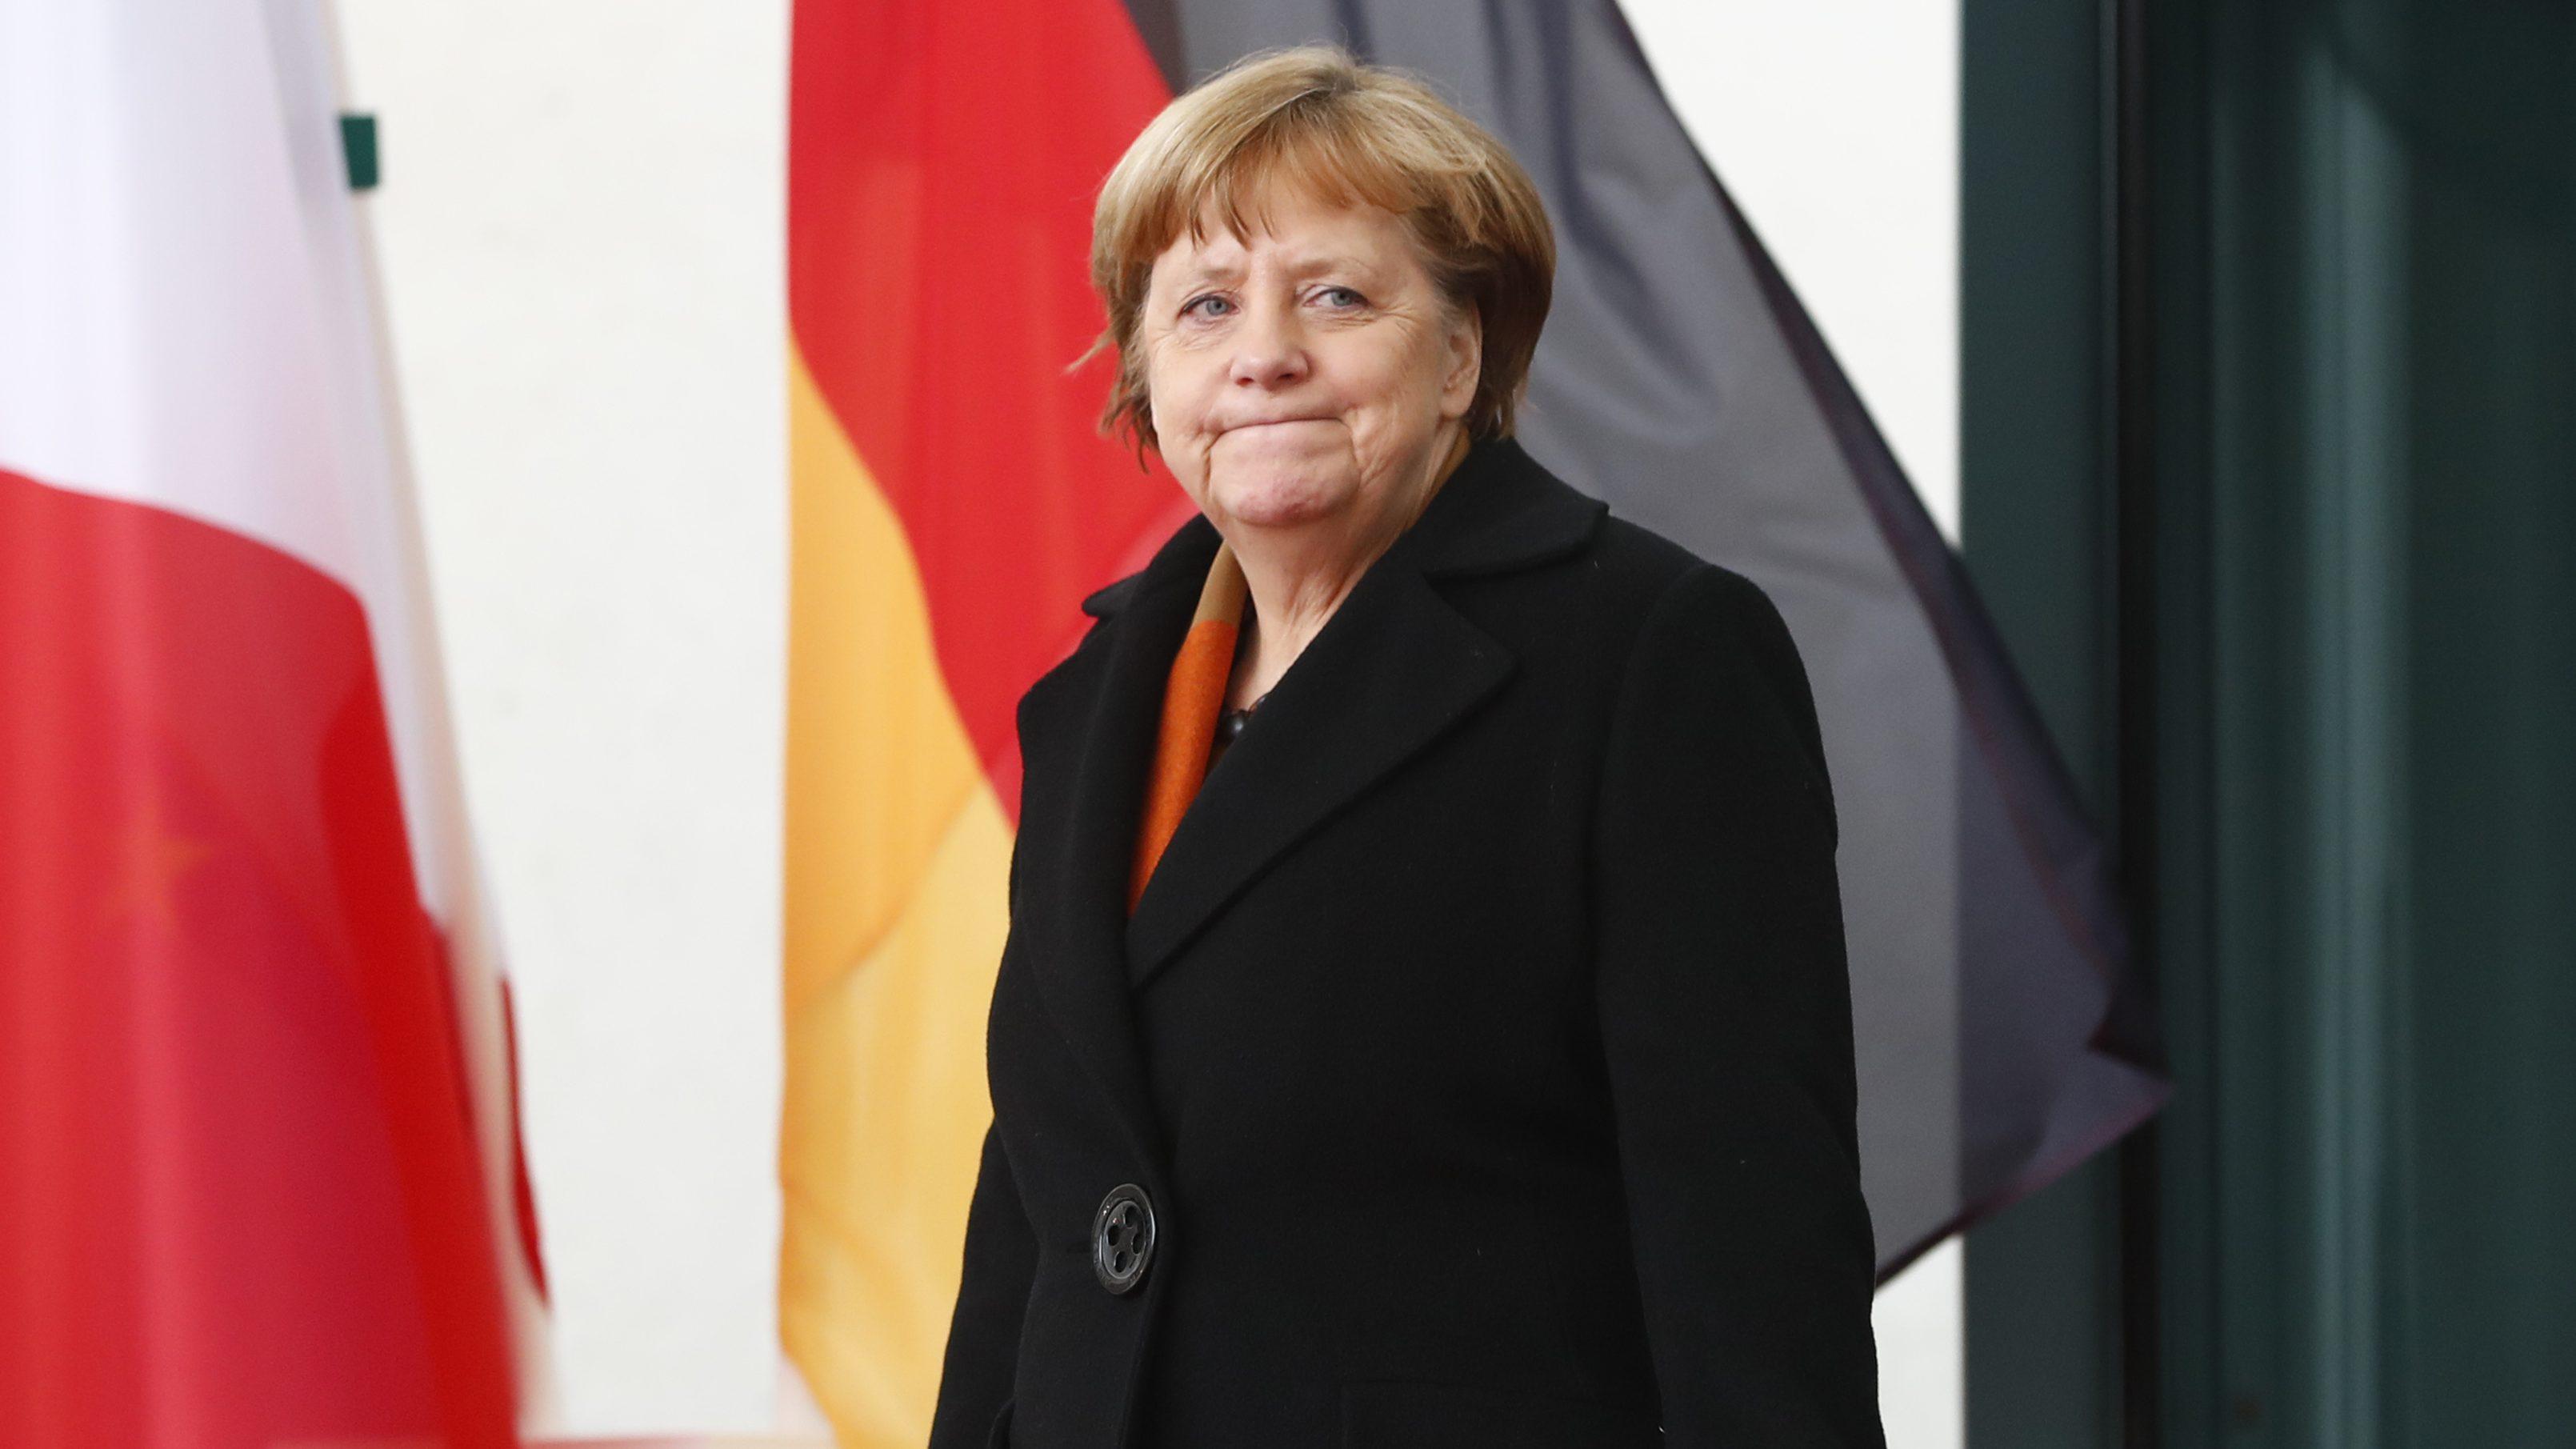 German Chancellor Angela Merkel  in front of flags